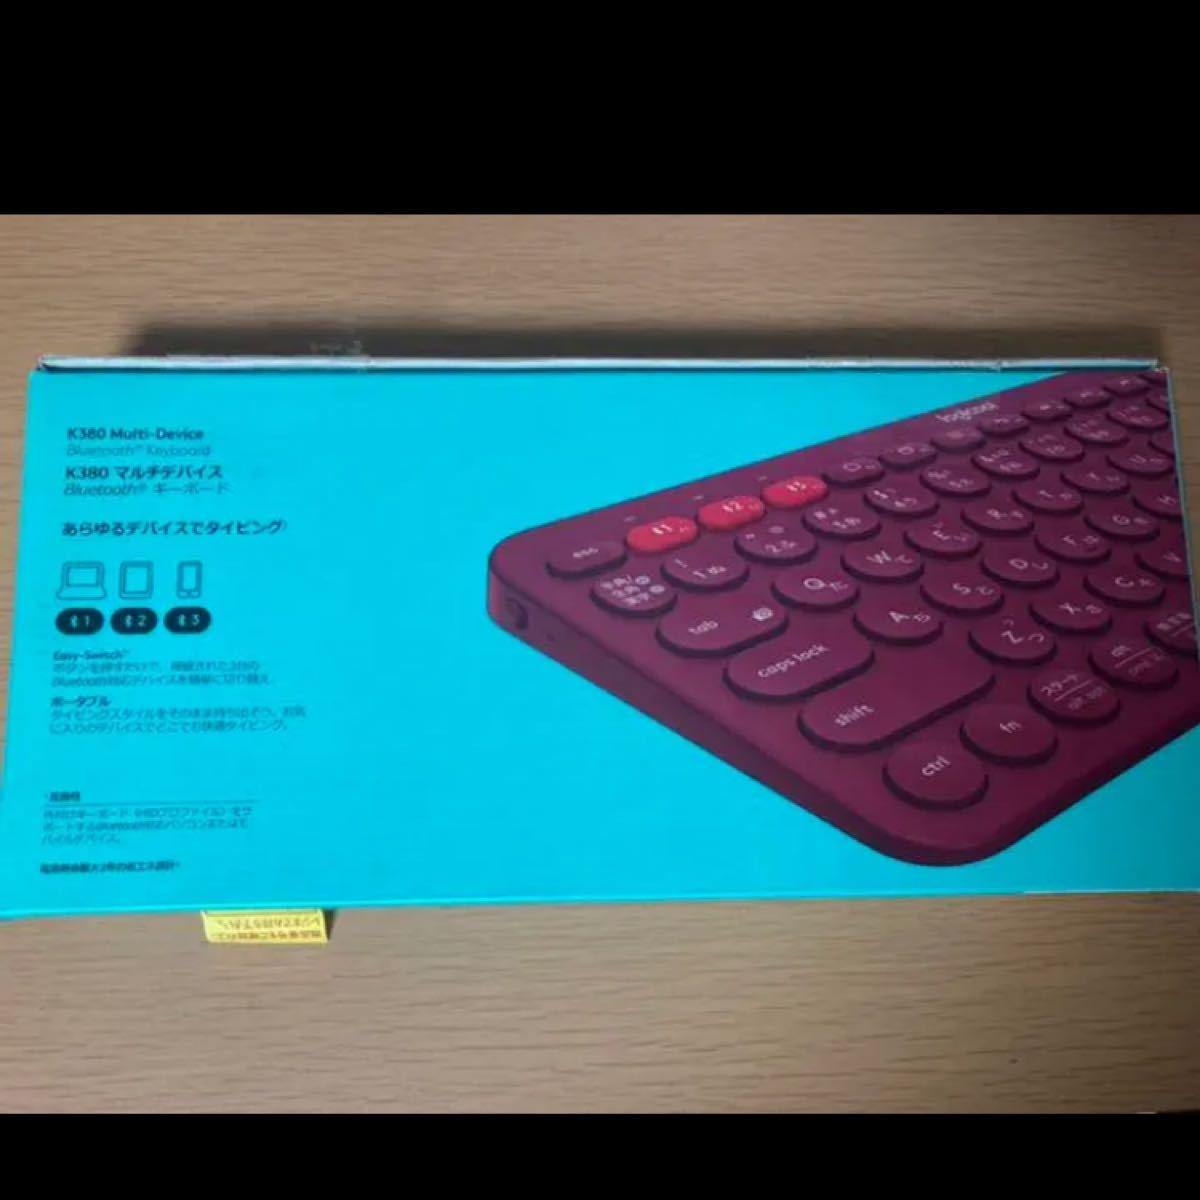 Logicool ロジクール Bluetoothキーボード Keyboard